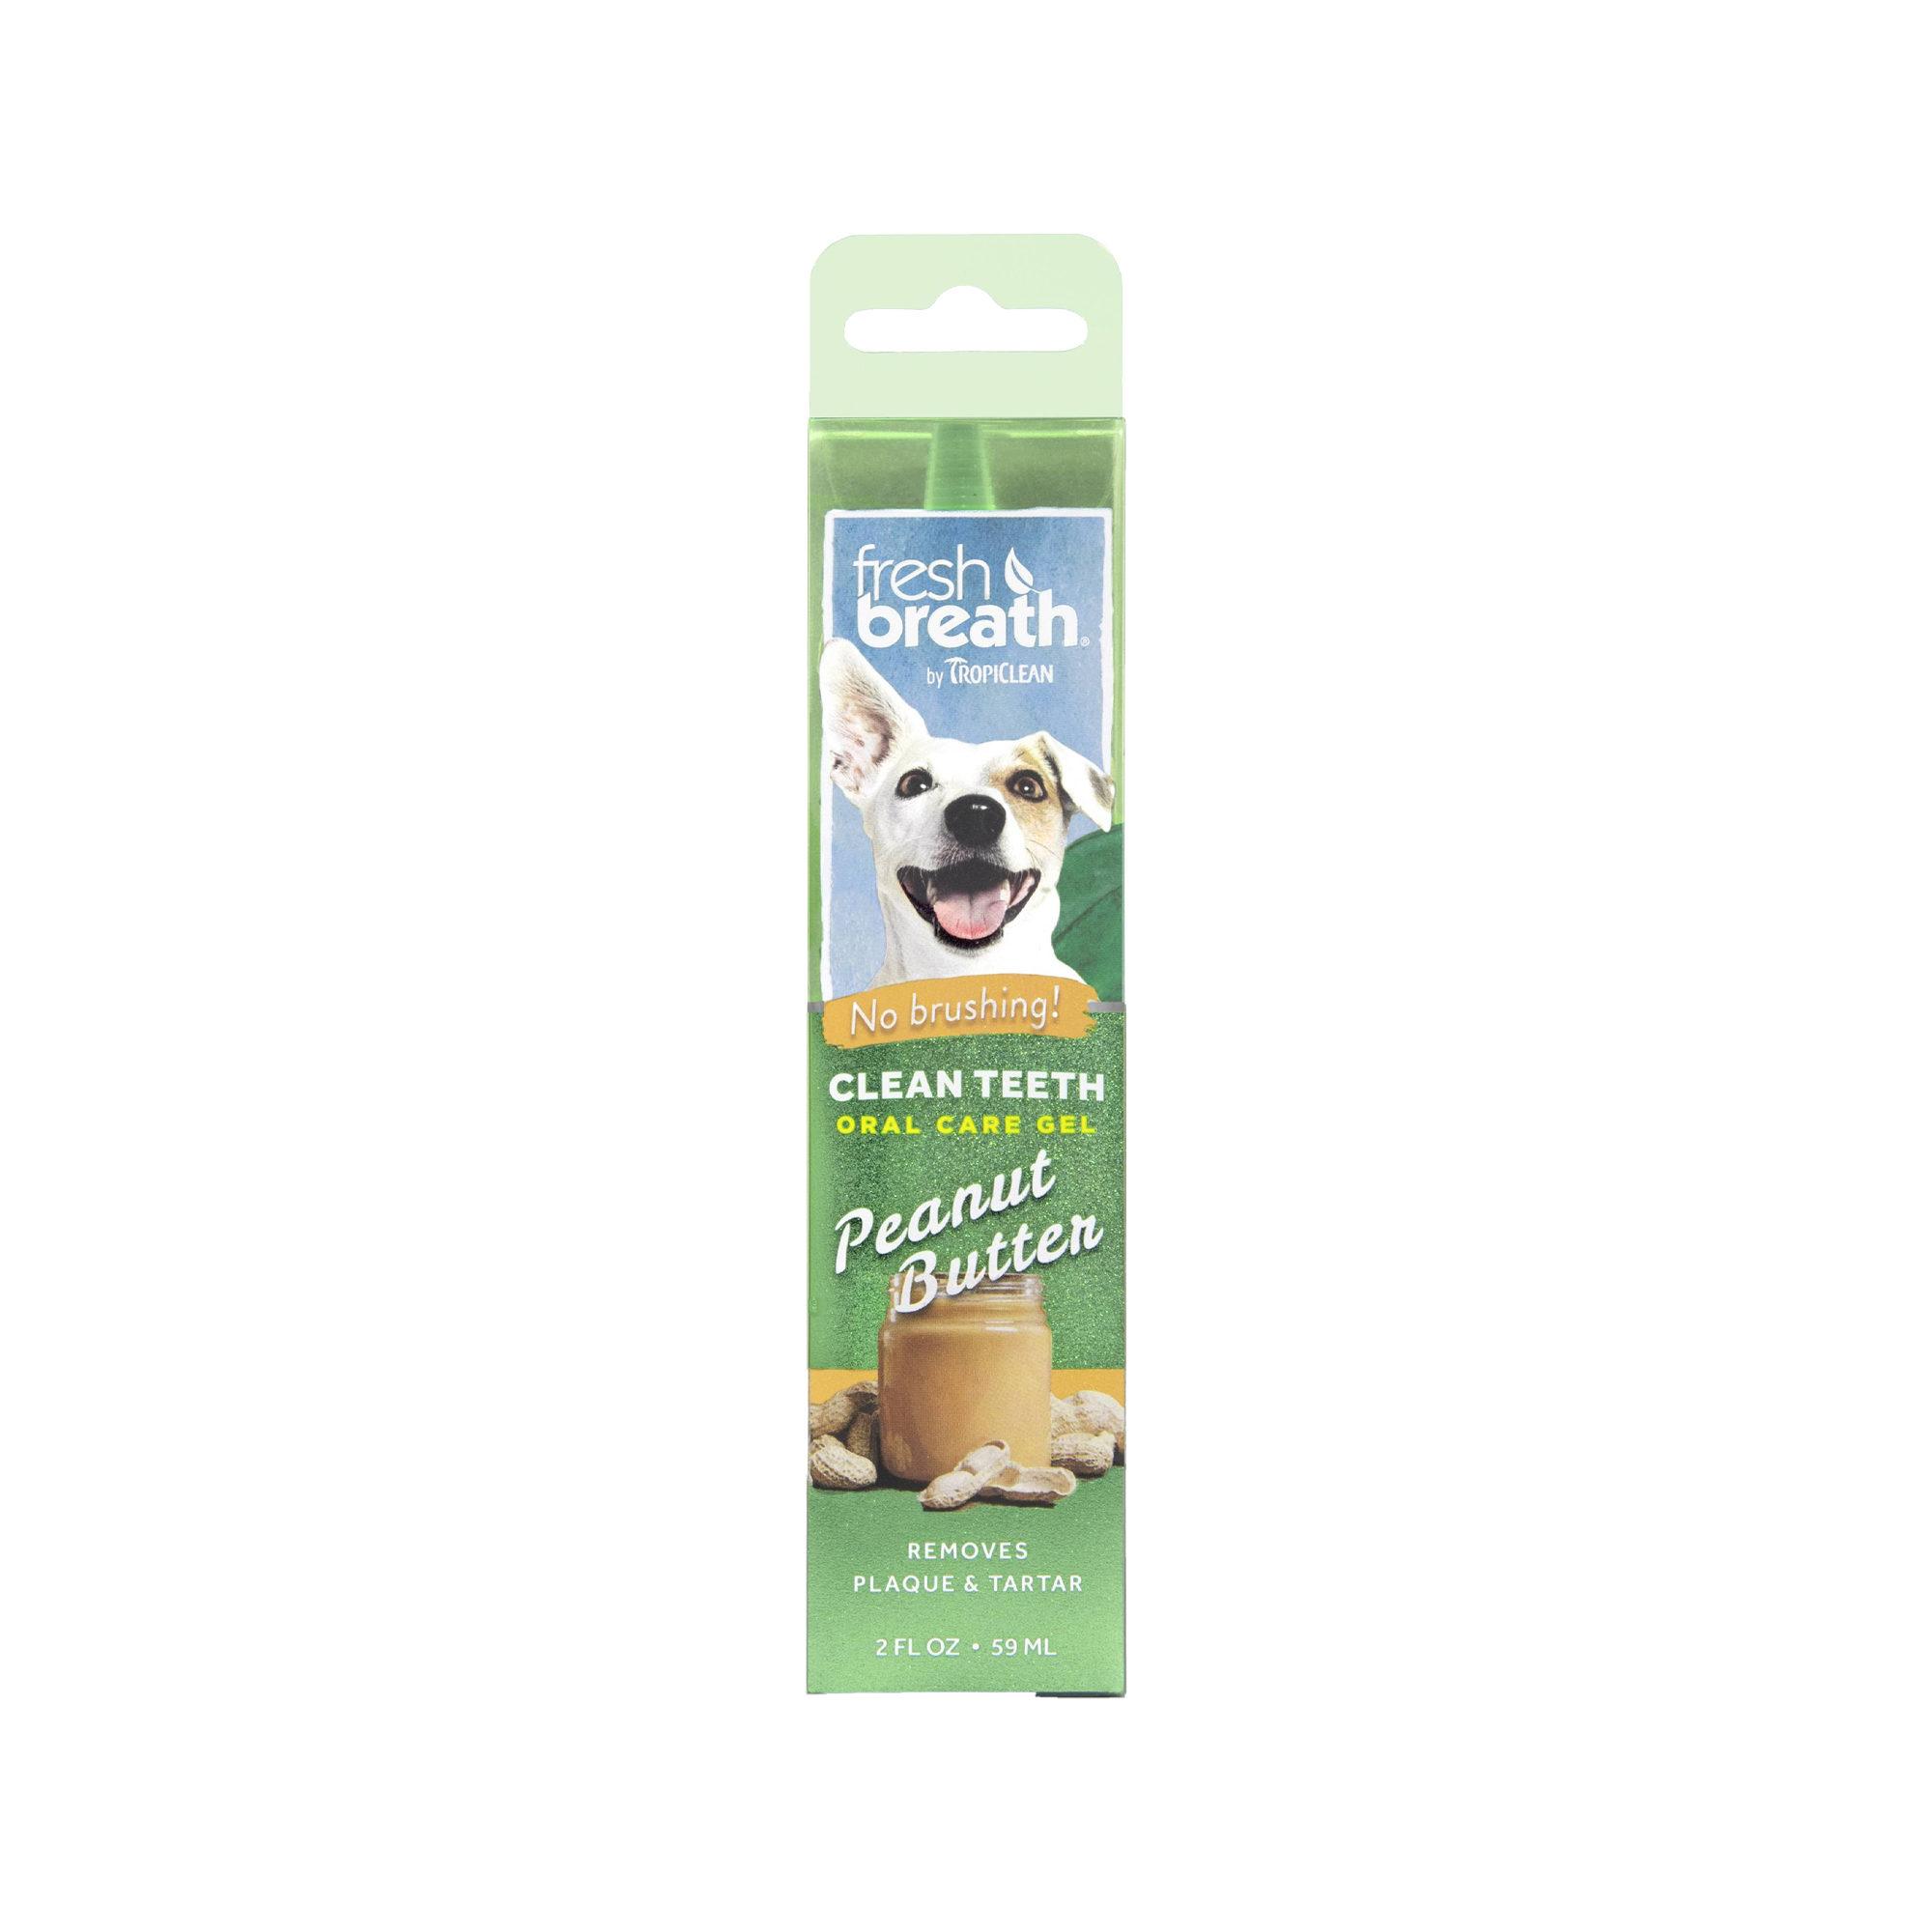 TropiClean Fresh Breath OralCareGel Kit Peanut Butter Hund